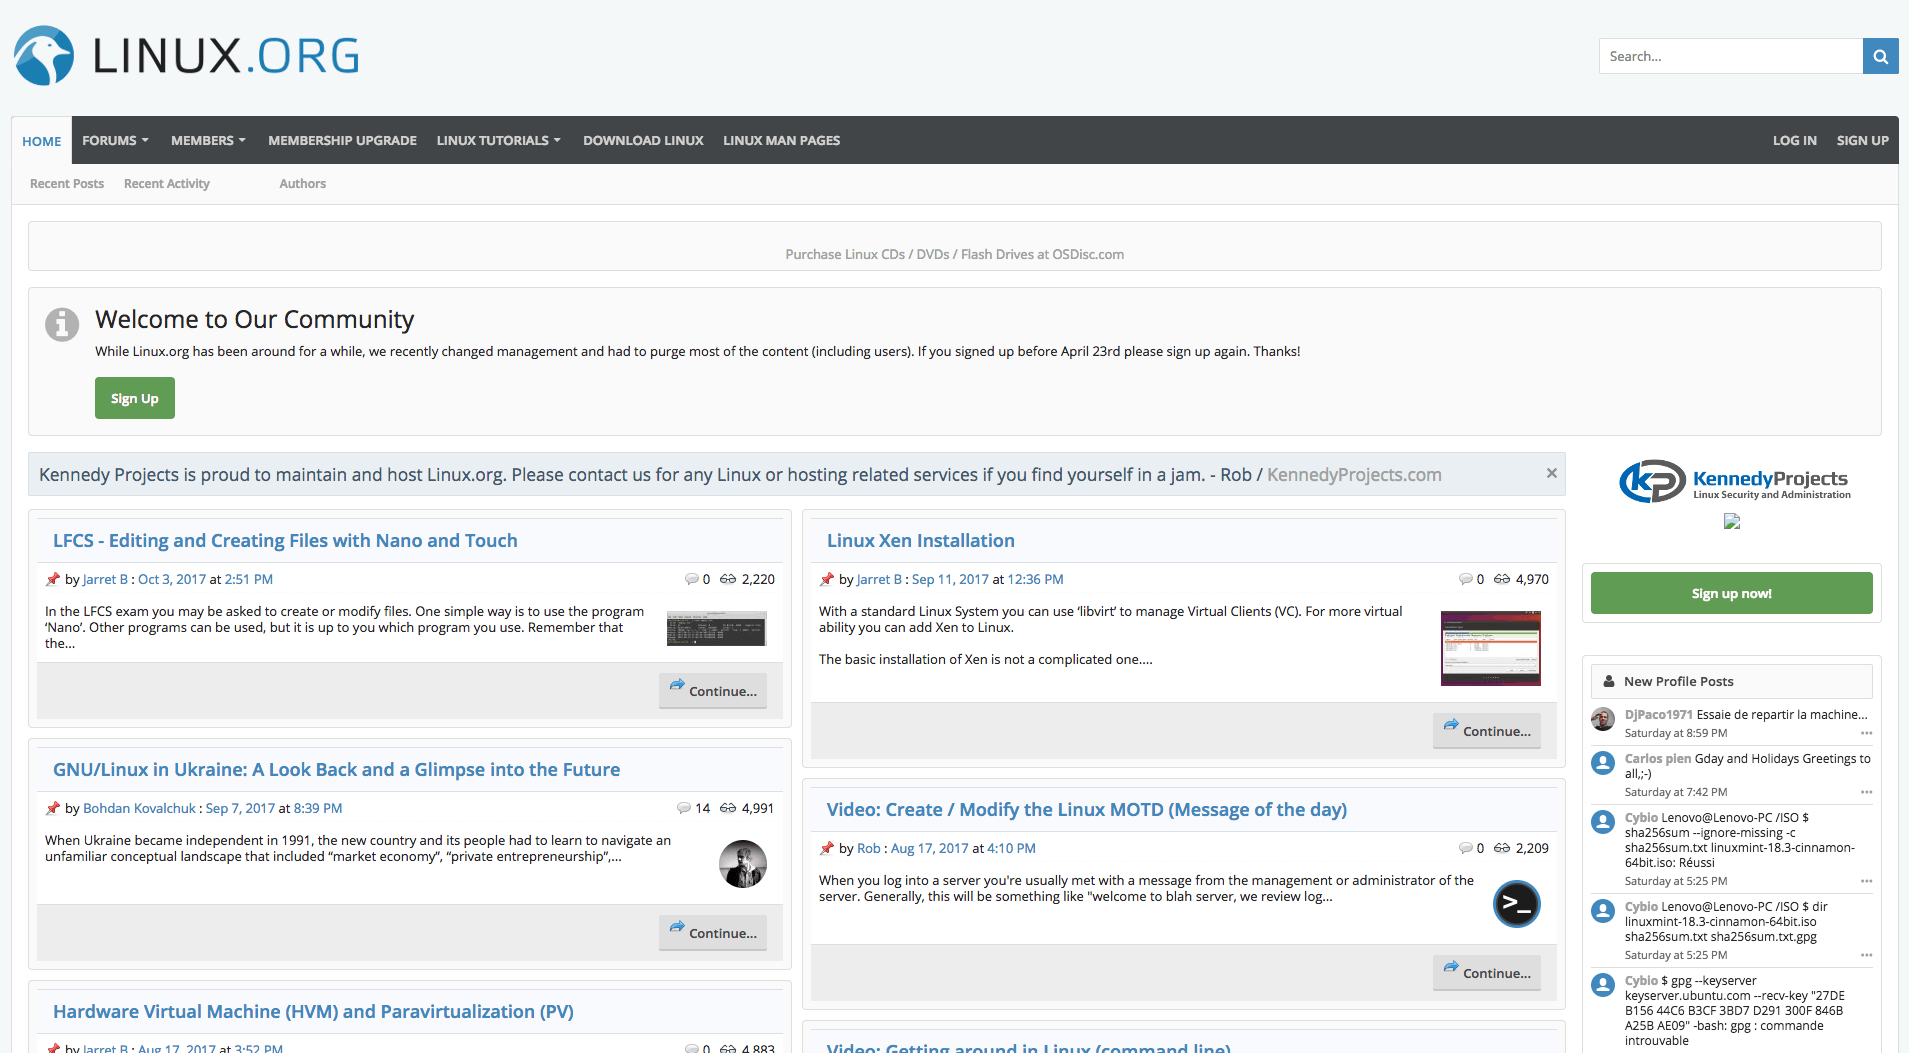 Linux Homepage